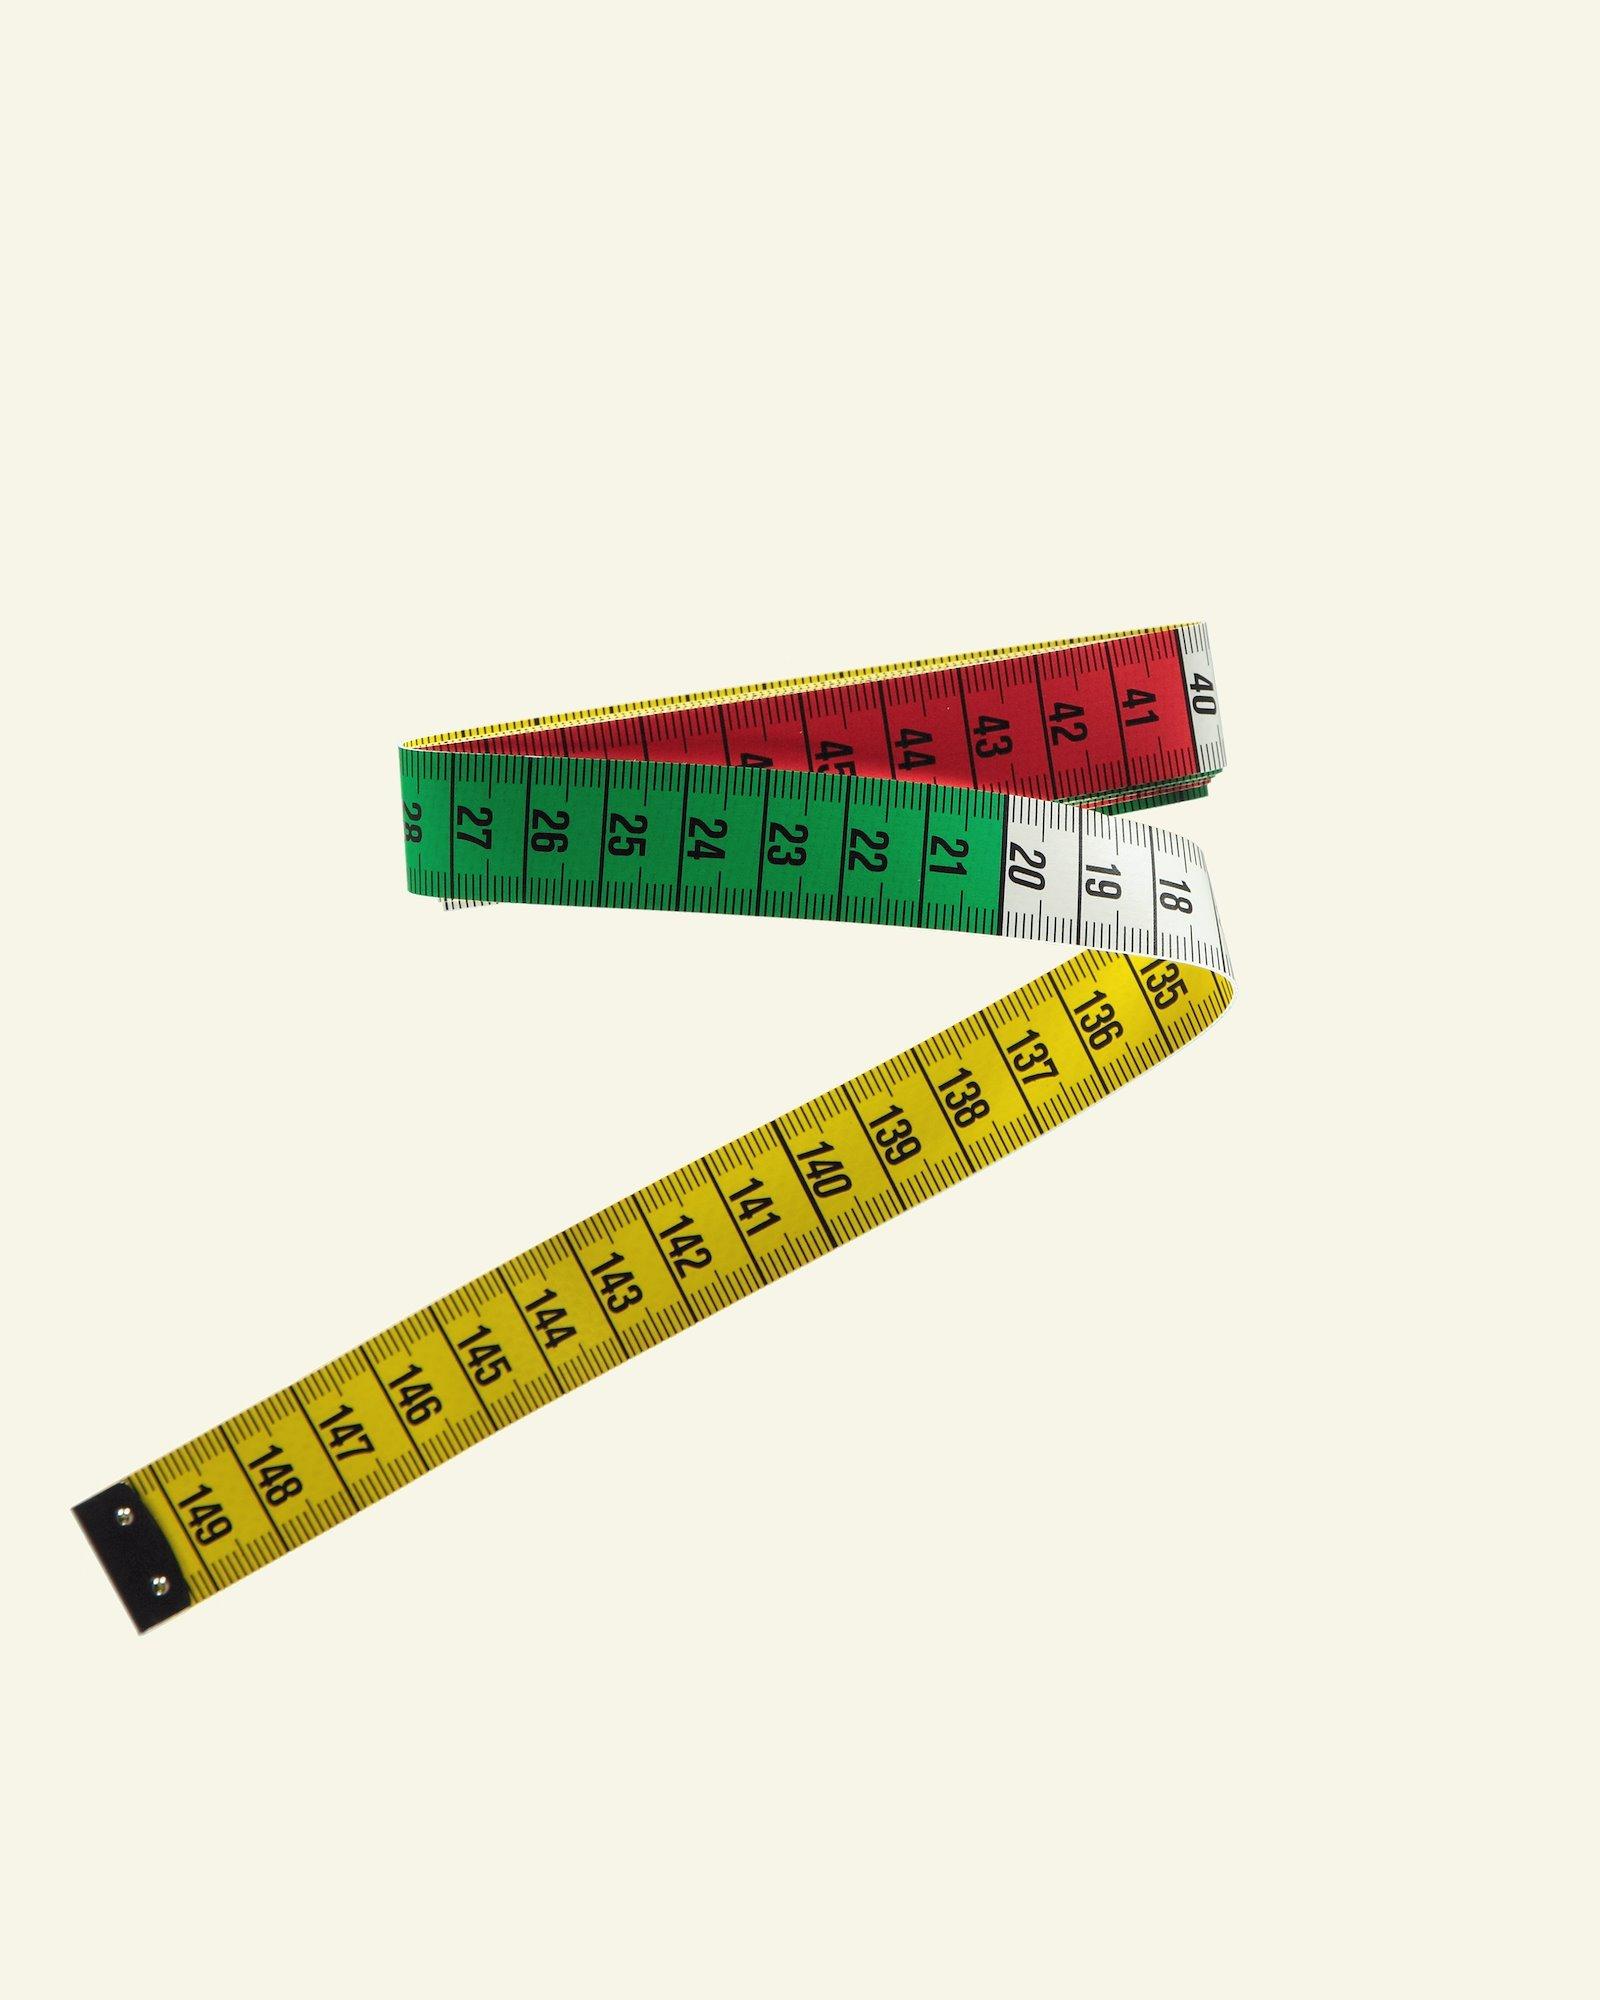 Prym tape measurer 150 cm